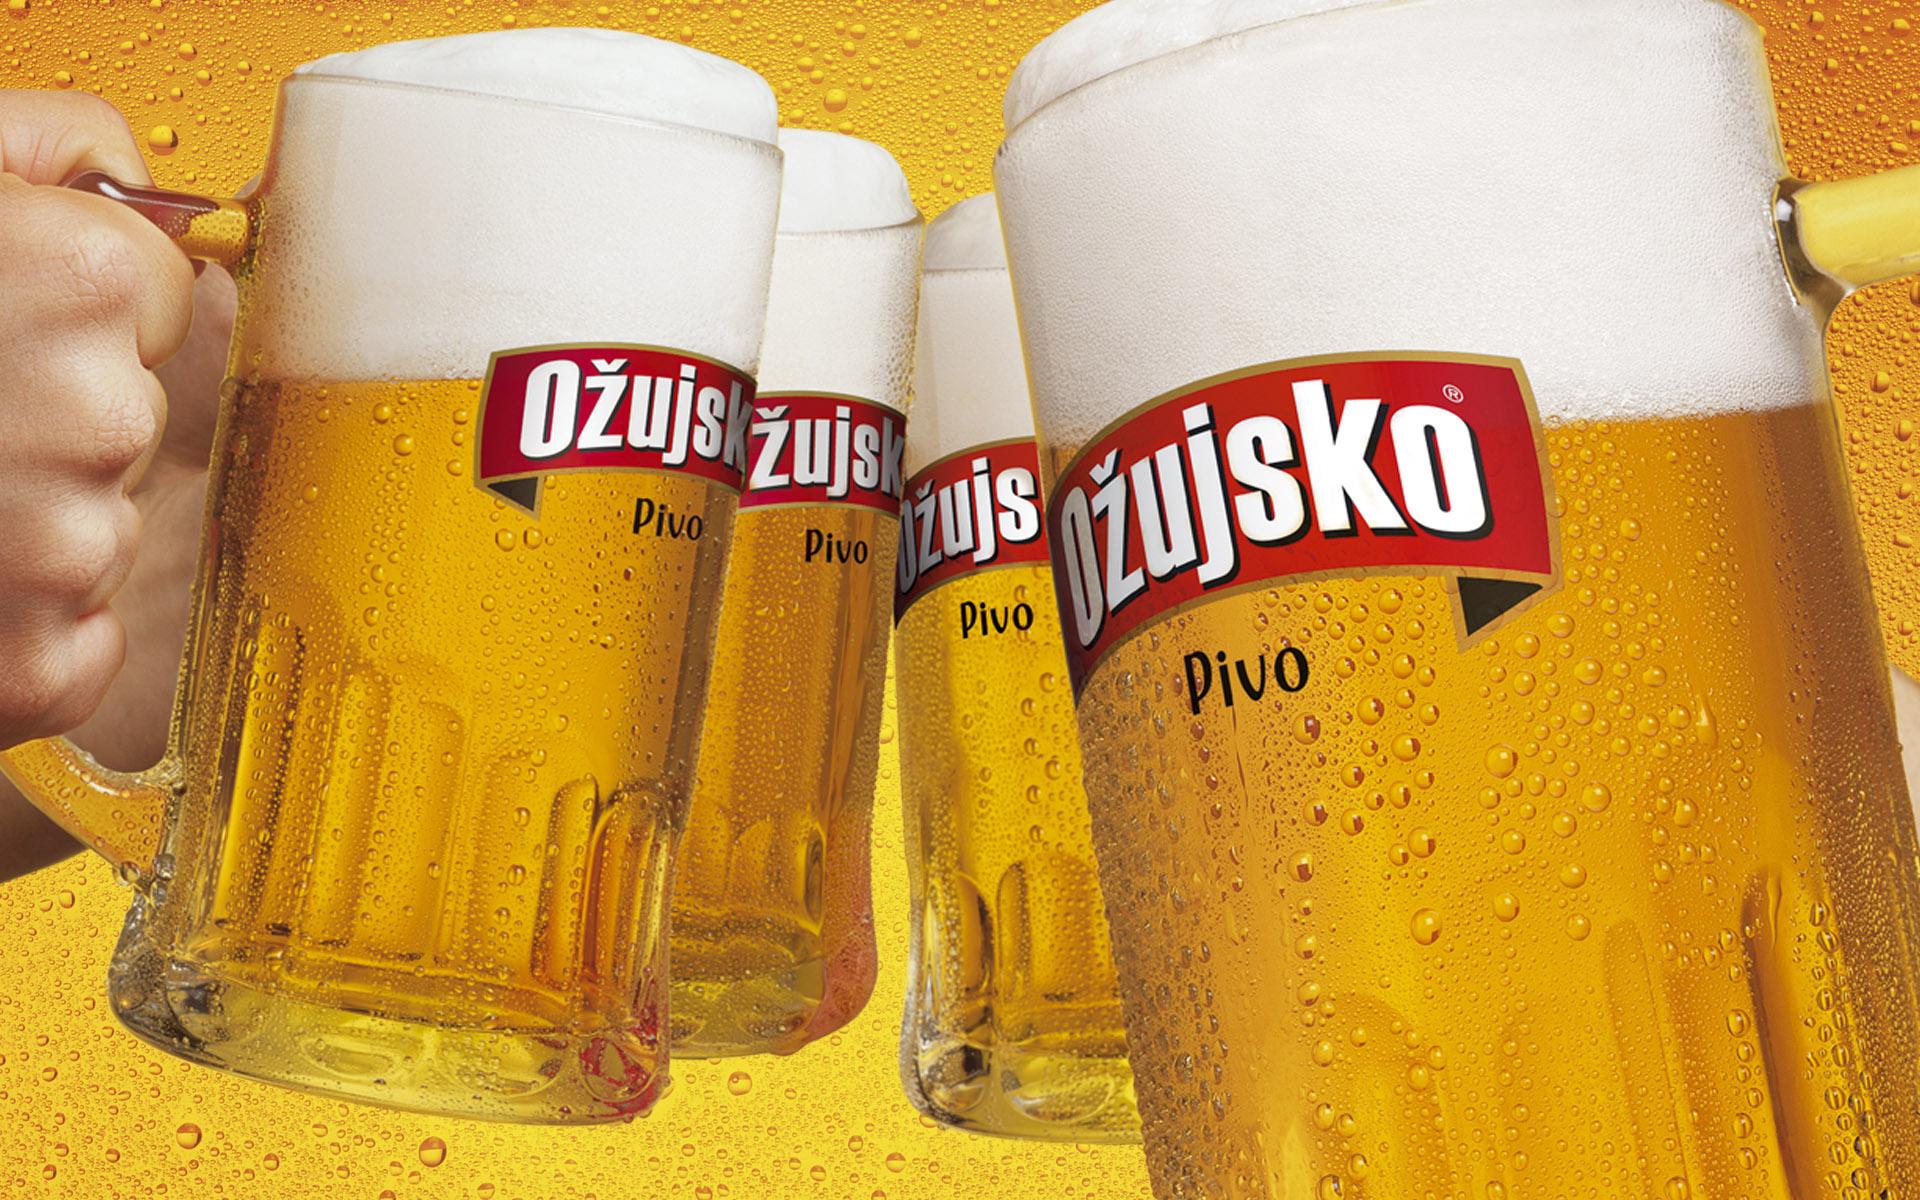 Croatian gastro brands ideal for souvenirs